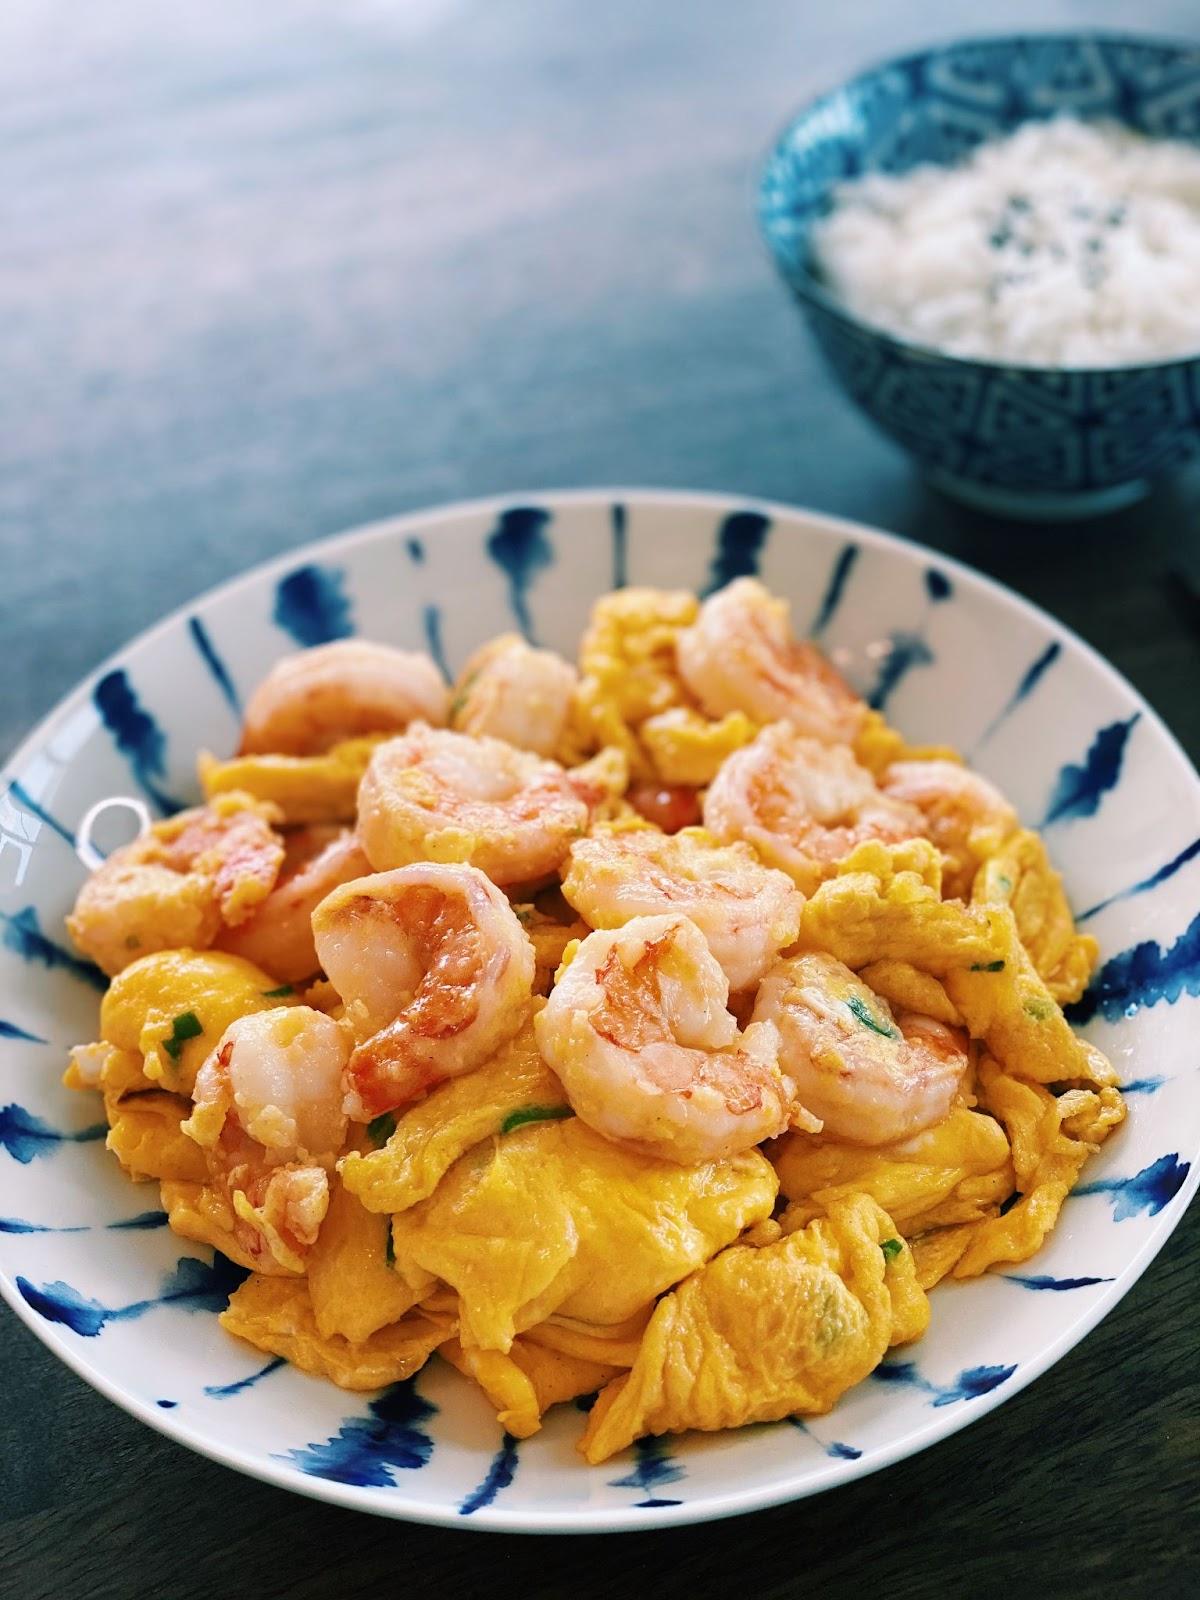 Shrimp and Egg Stir-fry (10 Minutes ONLY!)